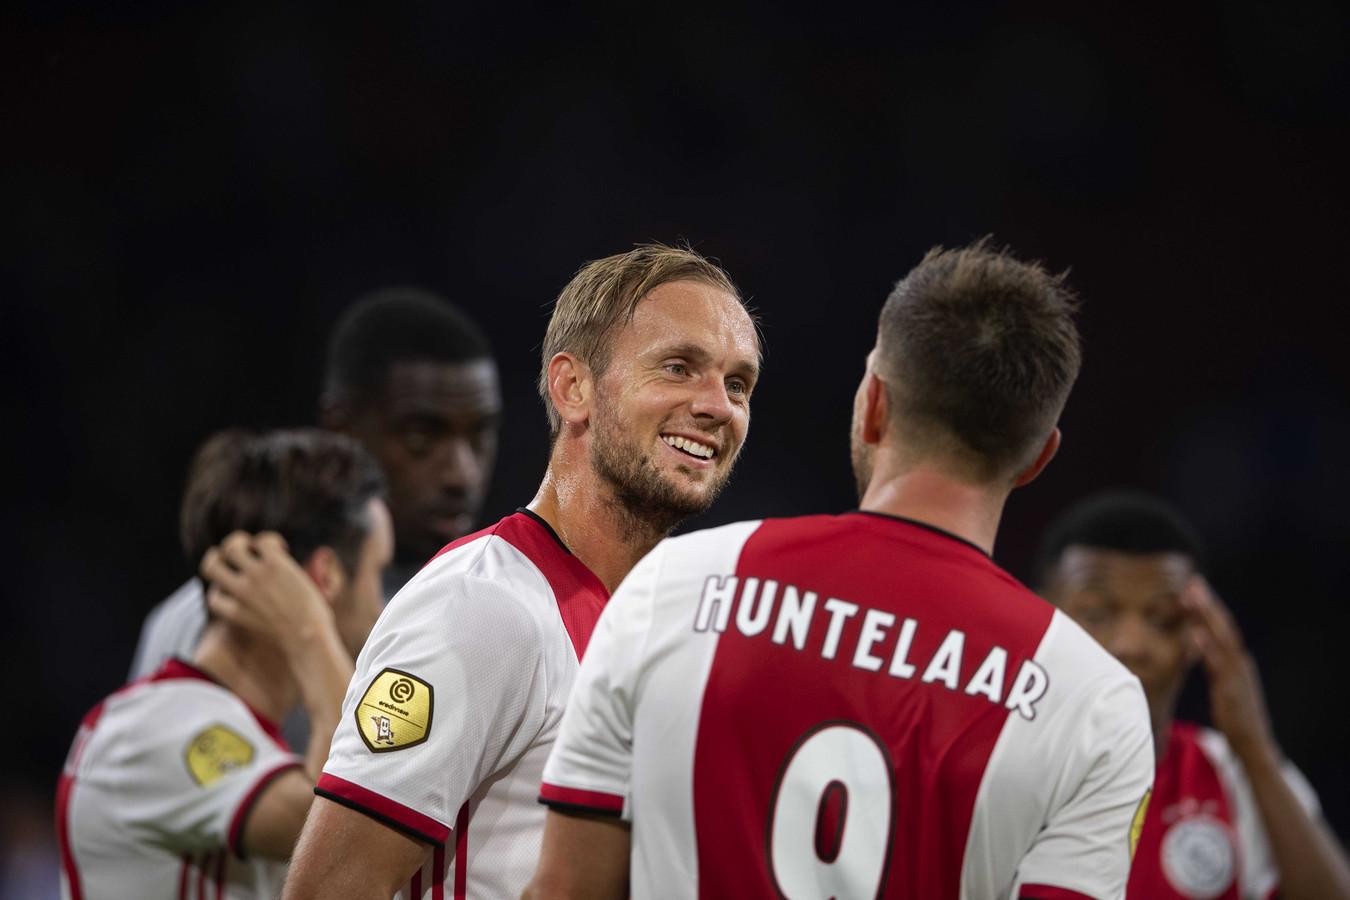 Siem de Jong met Klaas Jan Huntelaar.